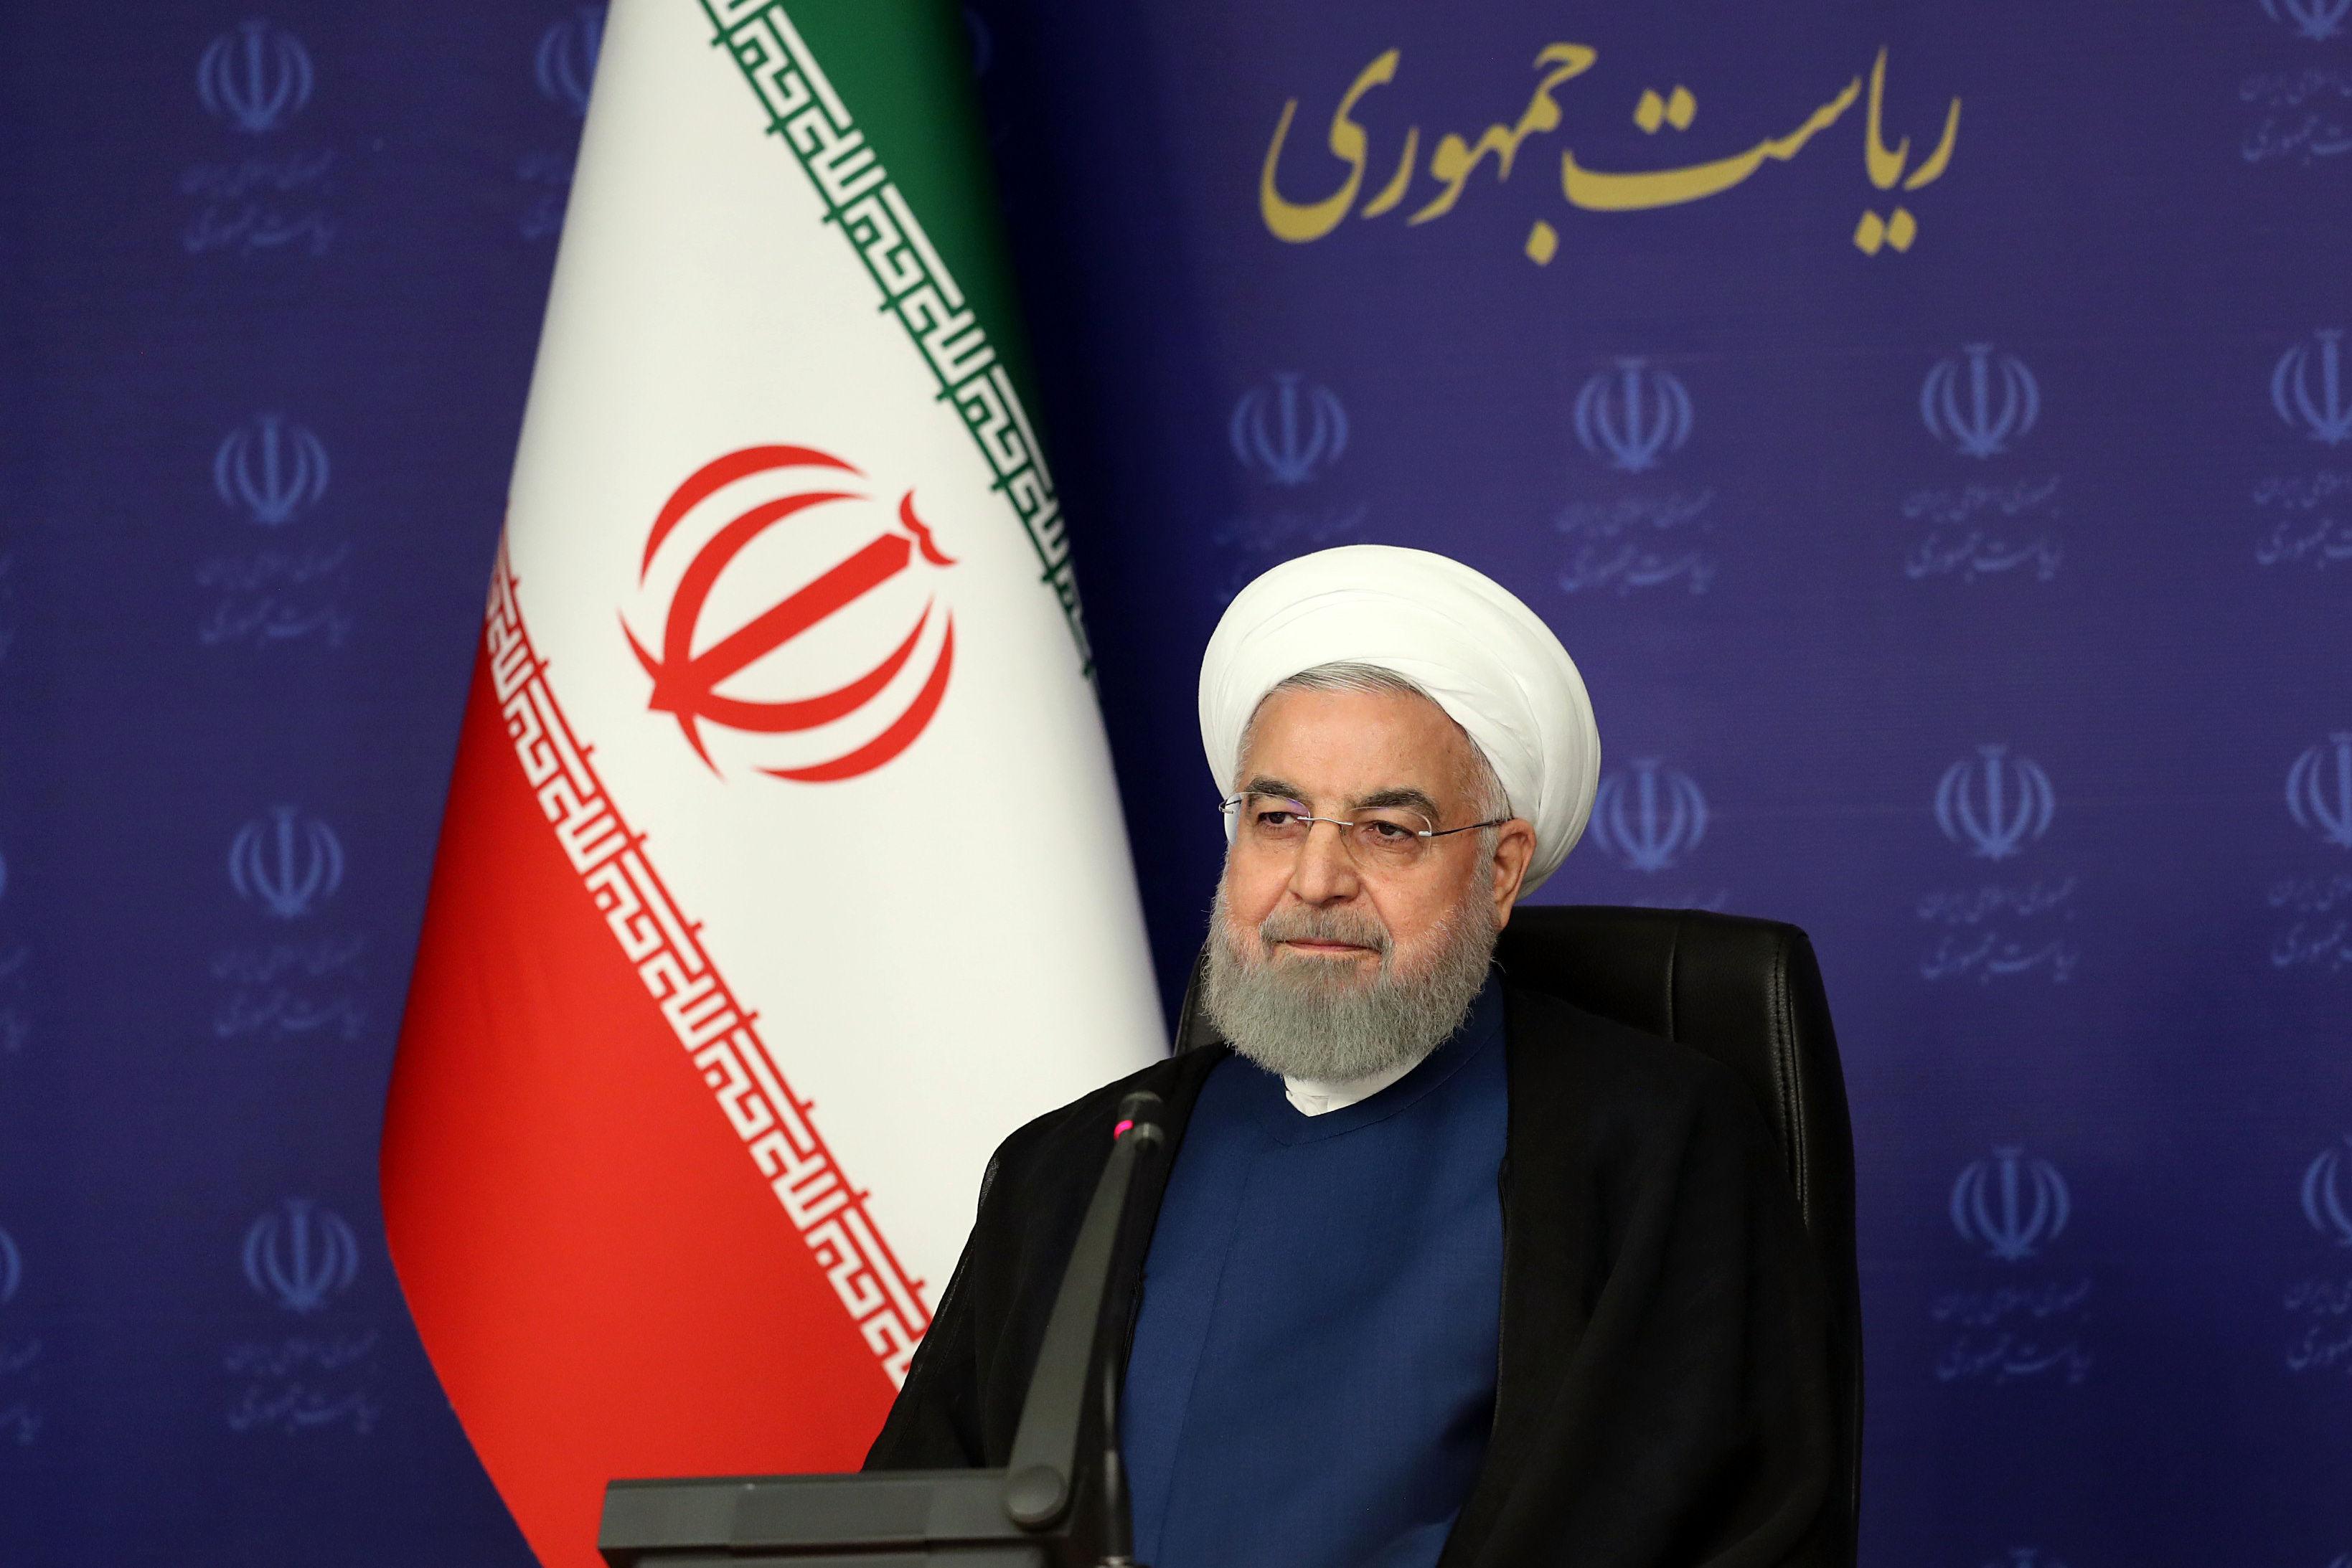 گالری حسن روحانی